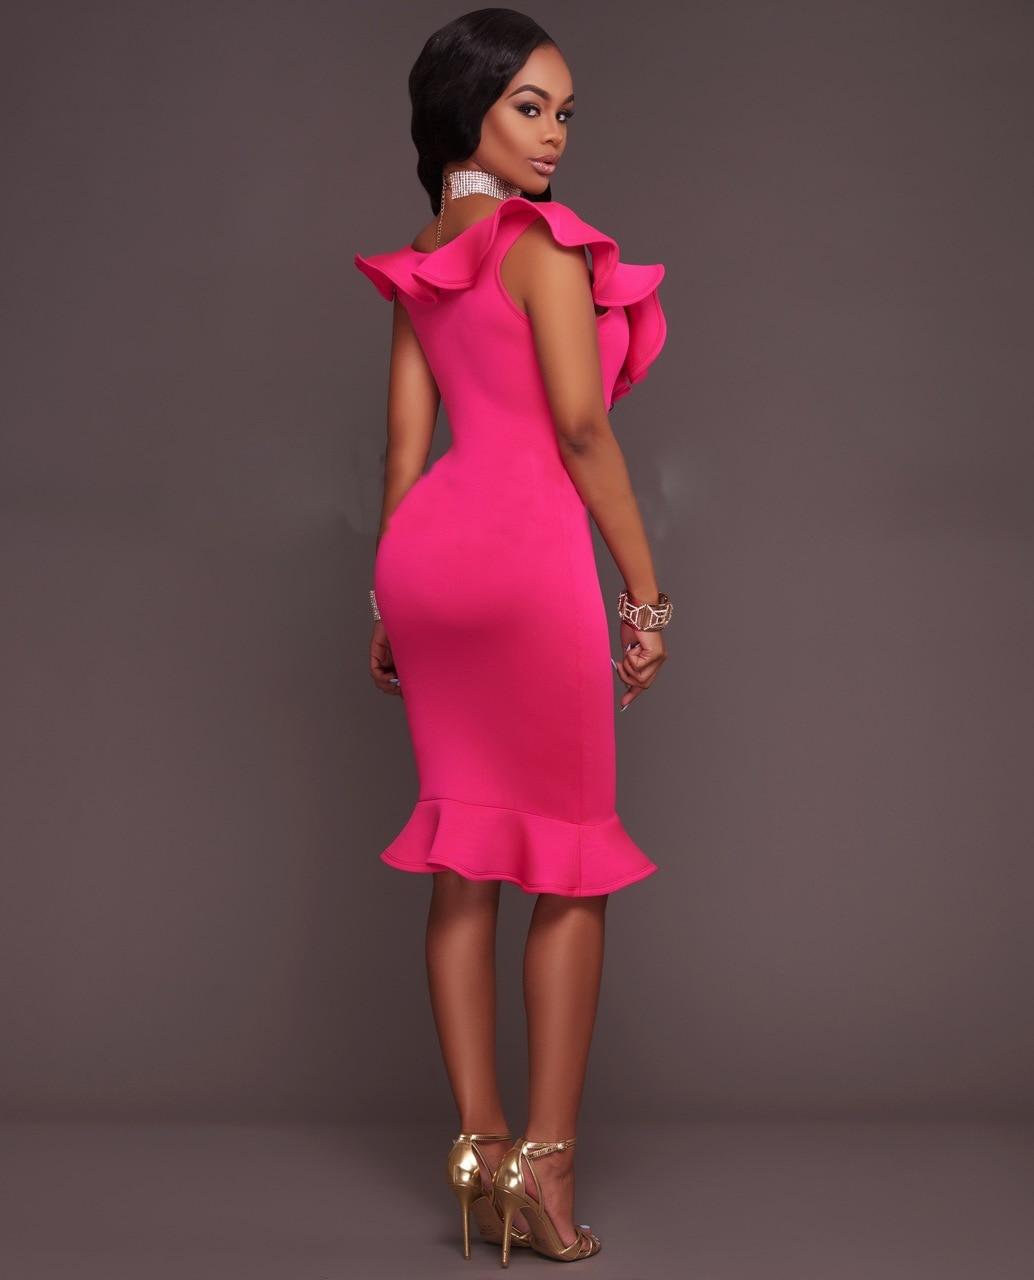 2017 Fashion Women Sexy Ruffles Dress Deep V-neck Slim Sleeveless Bodycon Dress Summer Party Yellow Casual Elegant Dresses 6